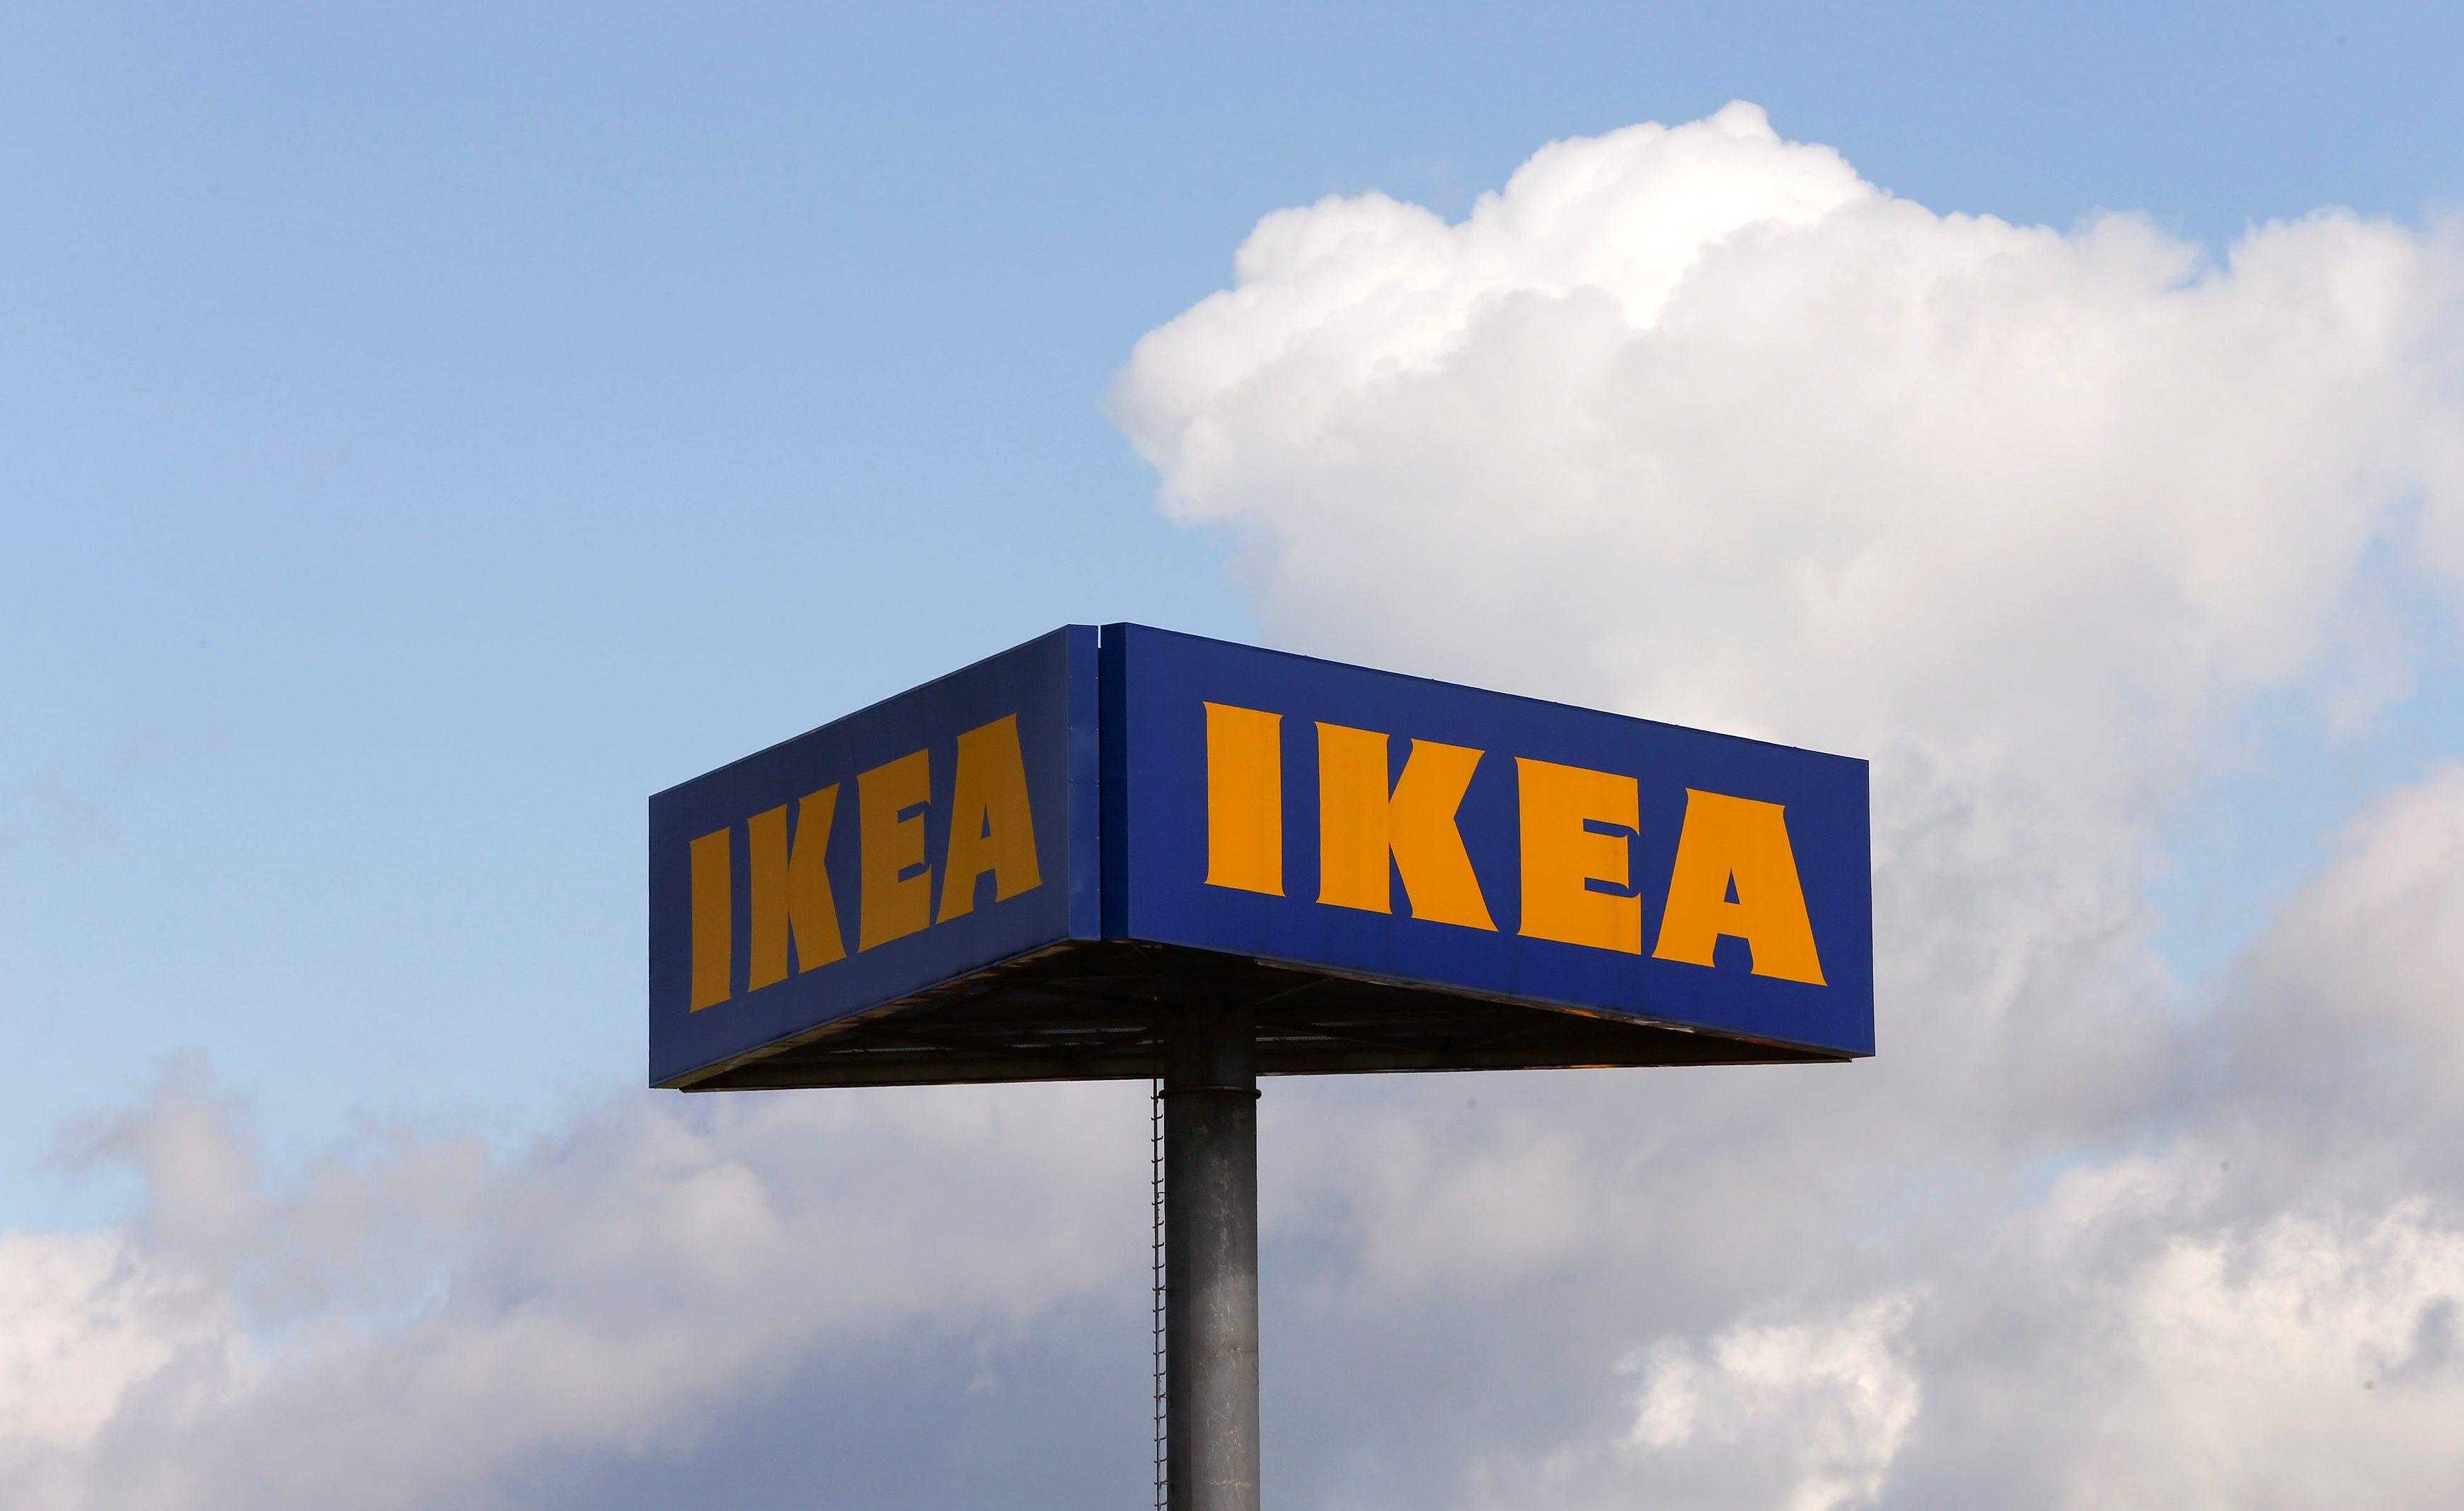 The company's logo is seen outside of an IKEA Group store in Spreitenbach, Switzerland April 27, 2016. REUTERS/Arnd Wiegmann - D1BETBDRNSAB